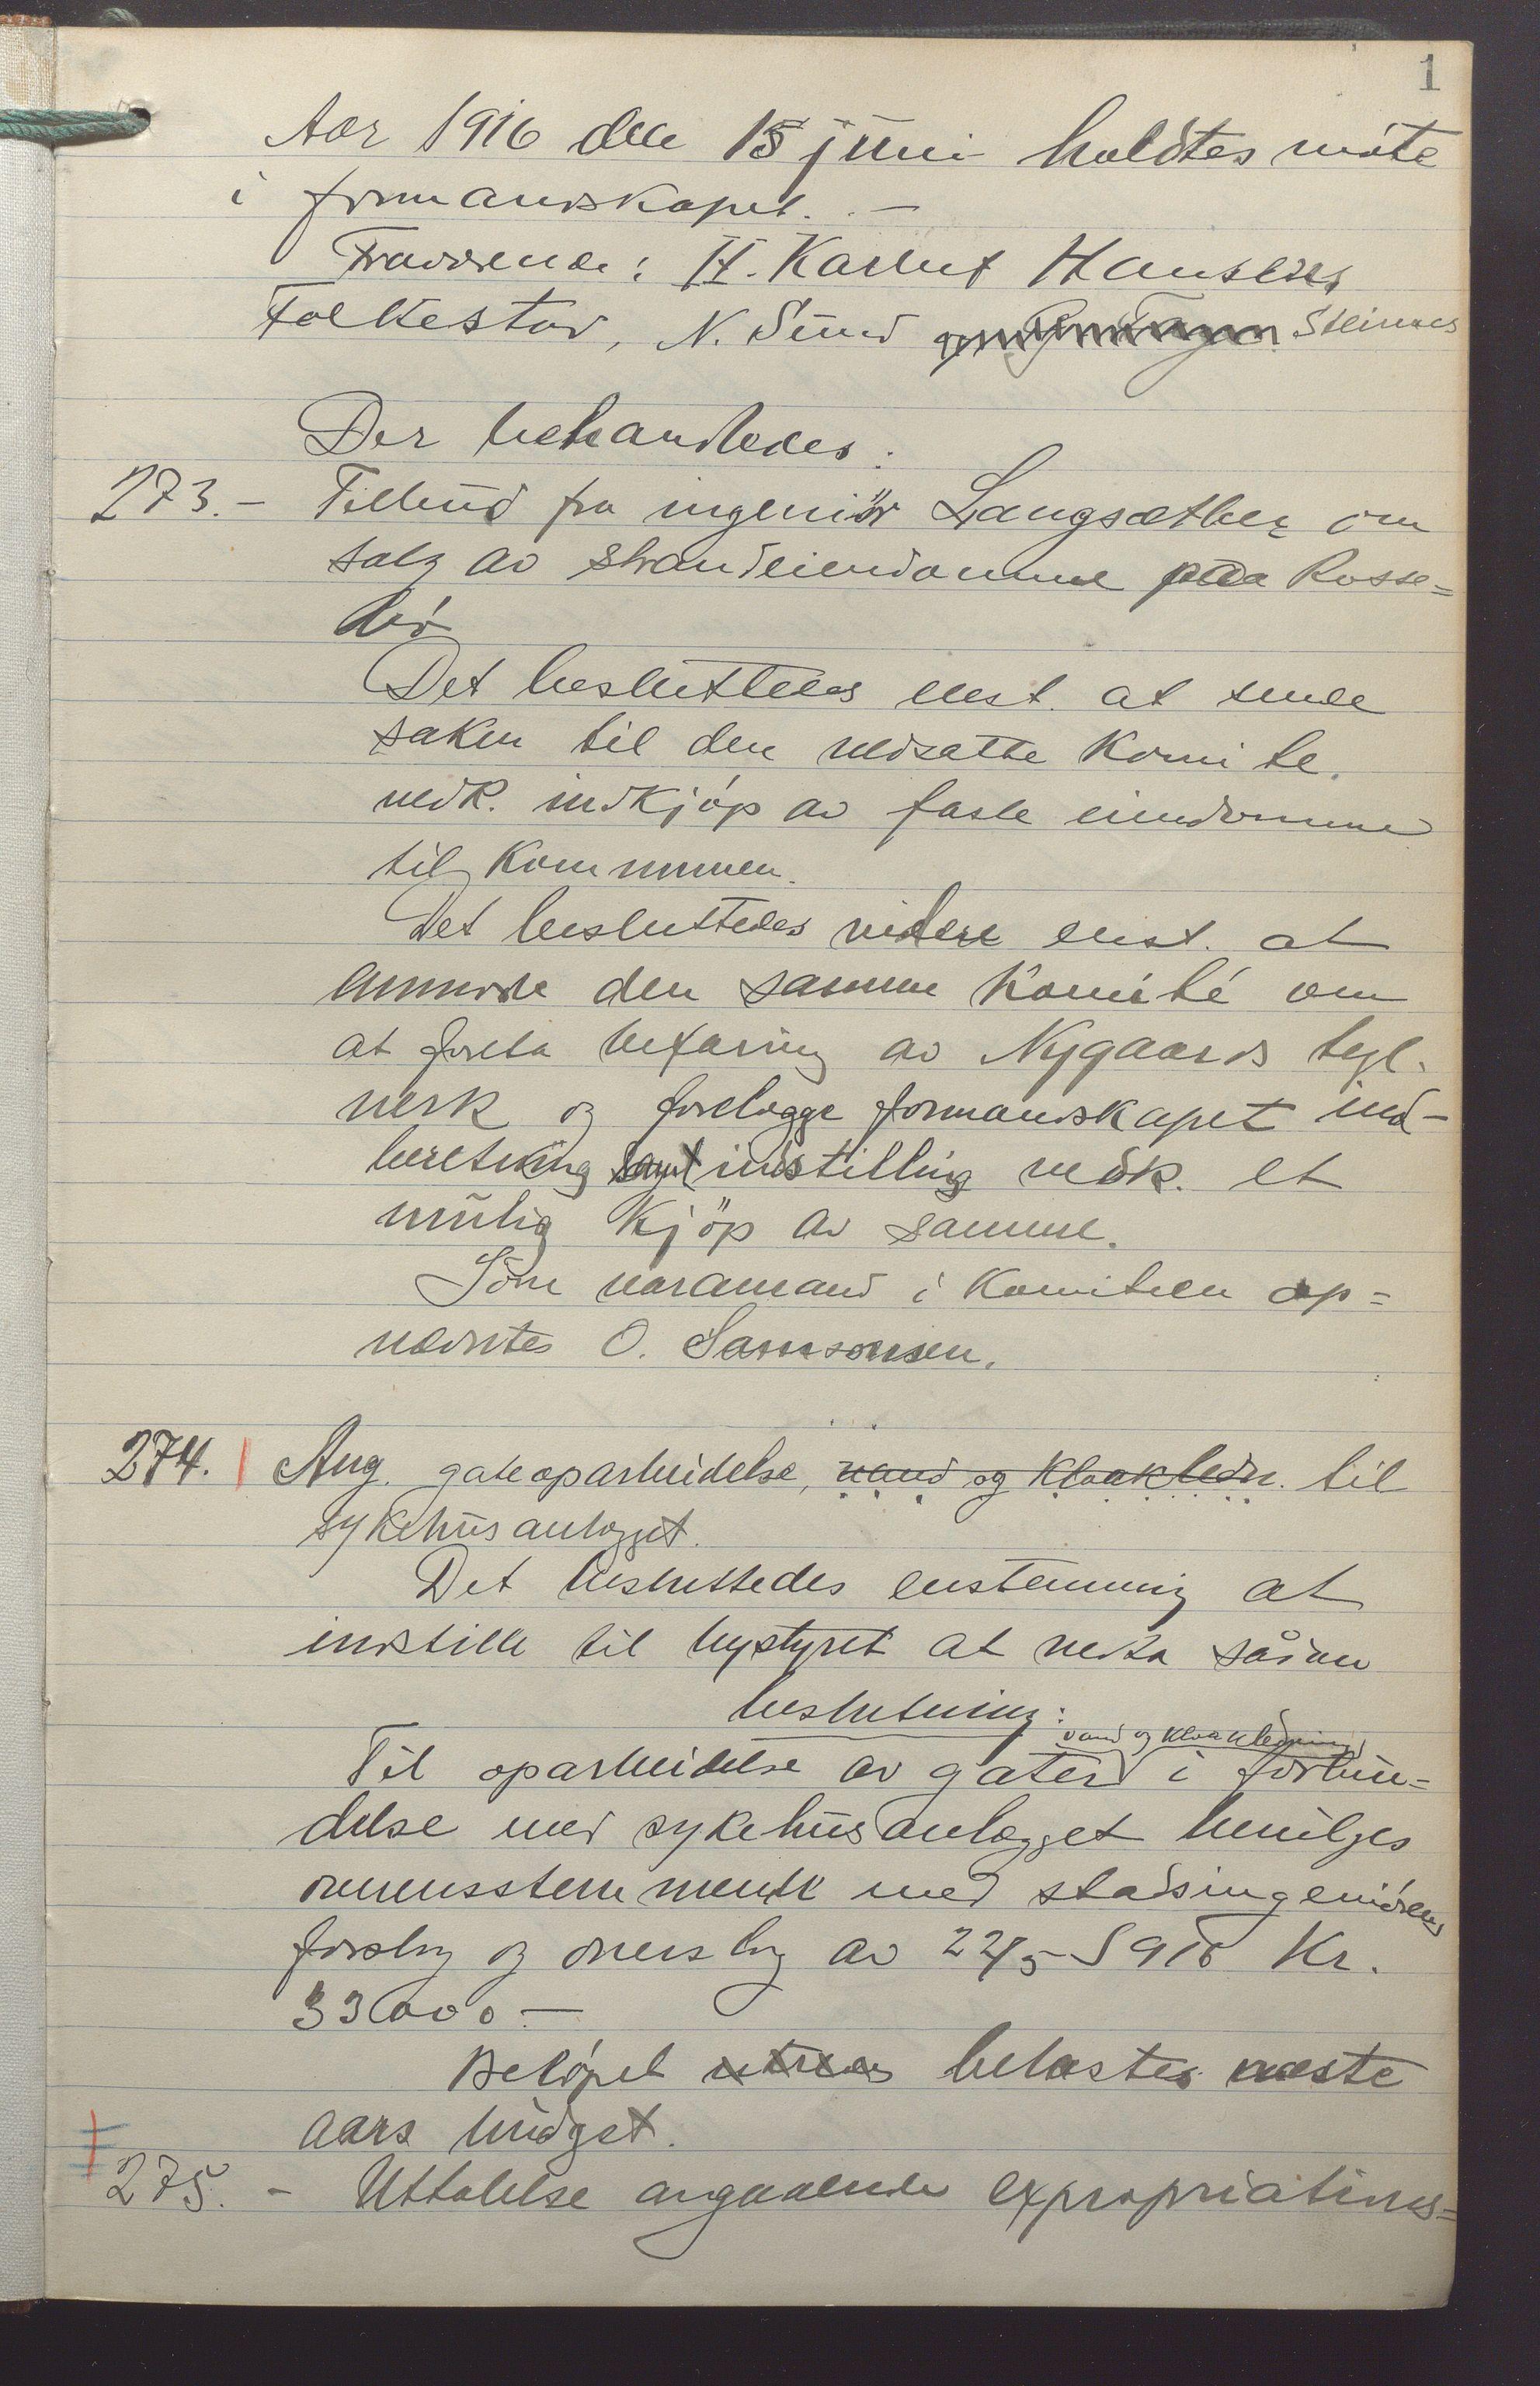 IKAR, Haugesund kommune - Formannskapet, 1916-1918, p. 1